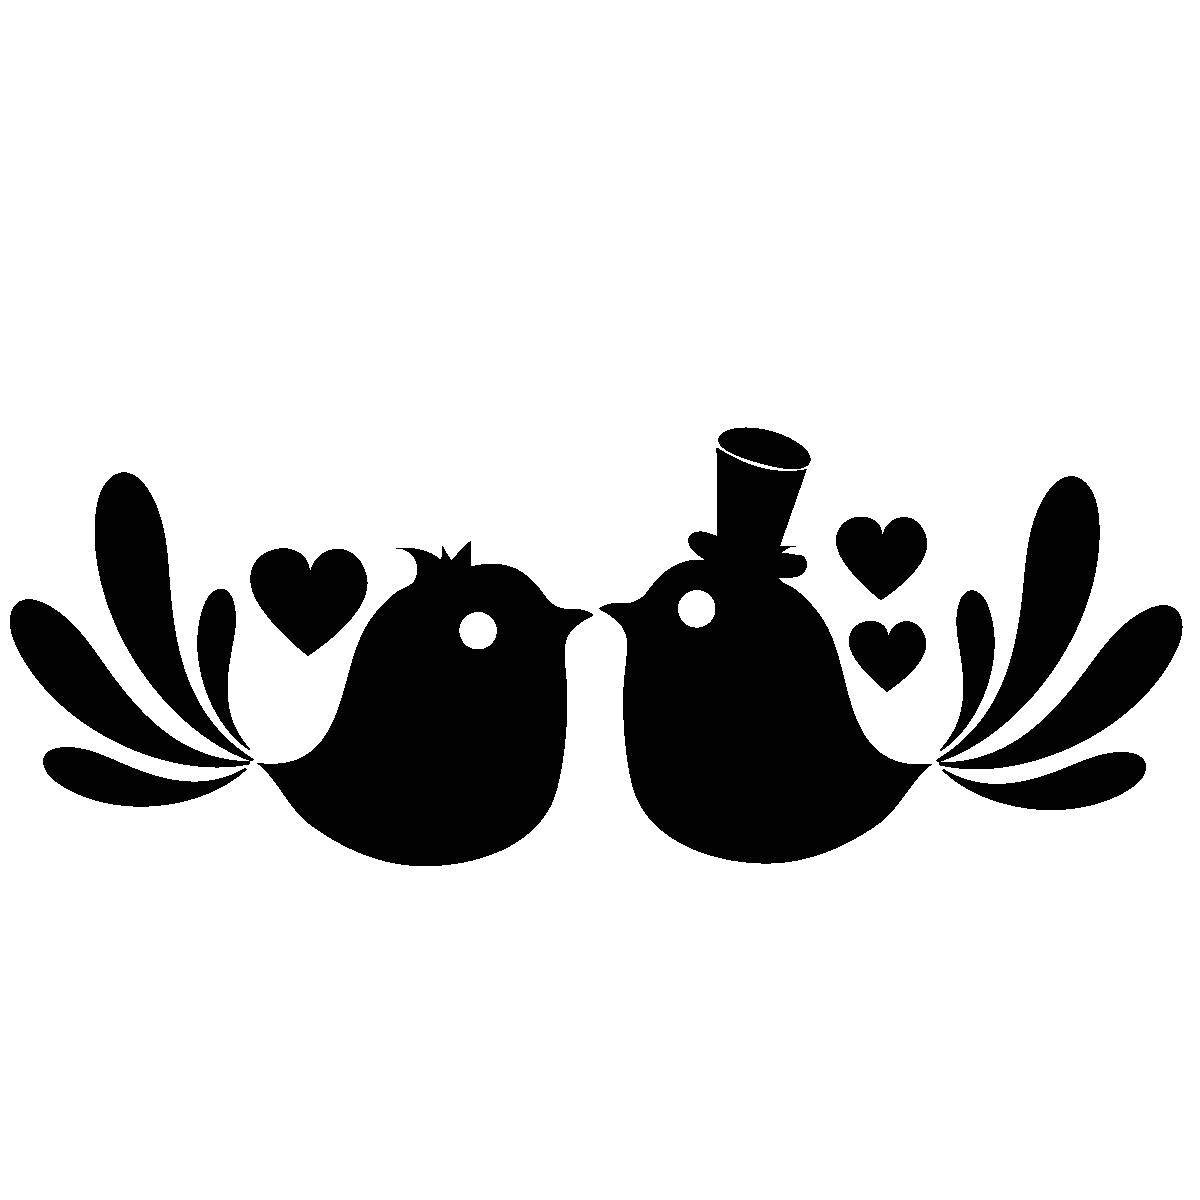 sticker dessin oiseaux amoureux stickers f tes stickers saint valentin ambiance sticker. Black Bedroom Furniture Sets. Home Design Ideas